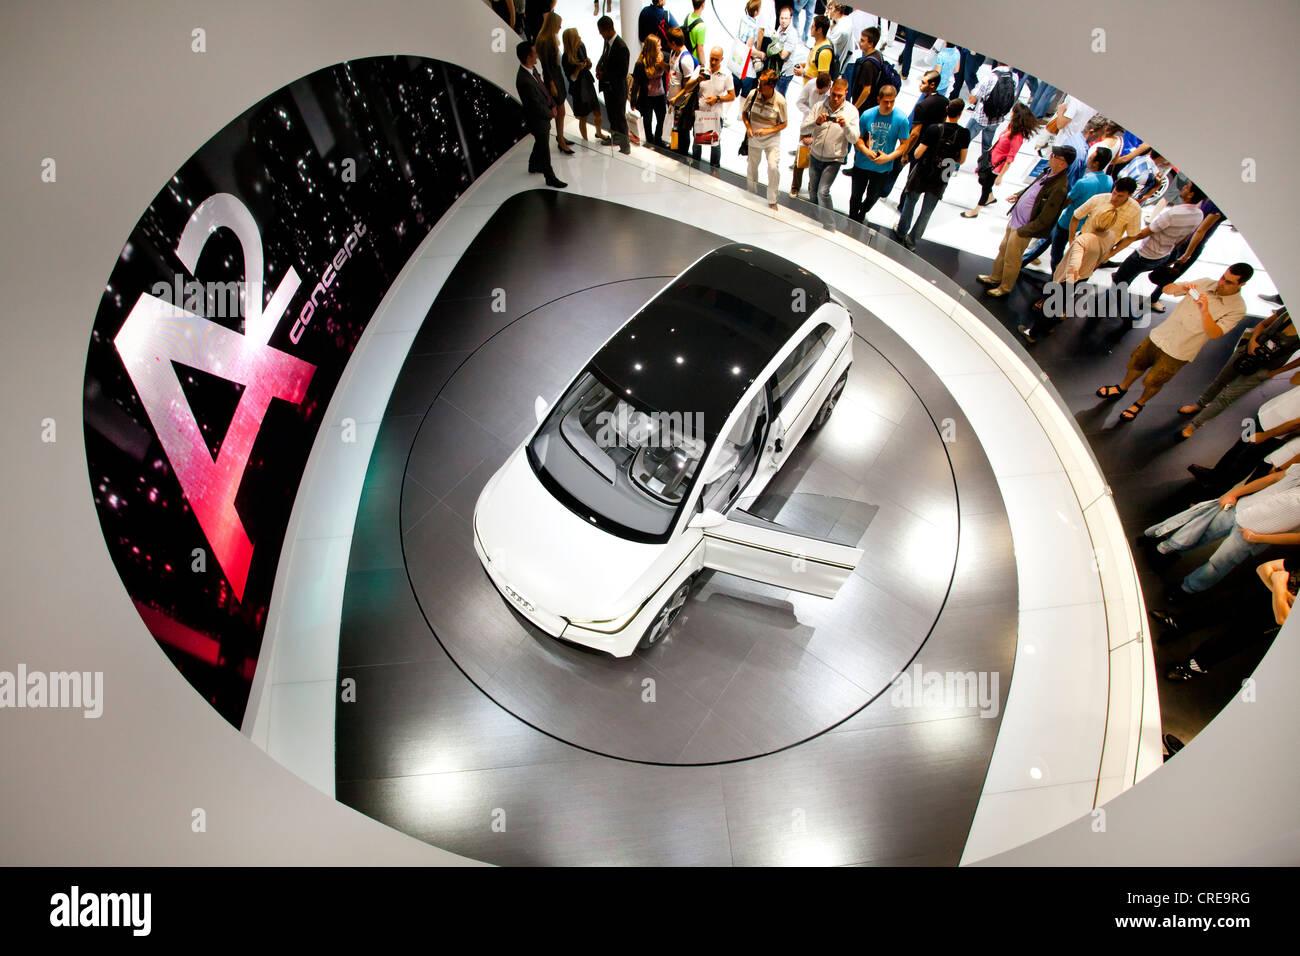 Estudio y estreno mundial del Audi A2 concept, Audi AG, 64º Salón Internacional del Automóvil IAA Imagen De Stock